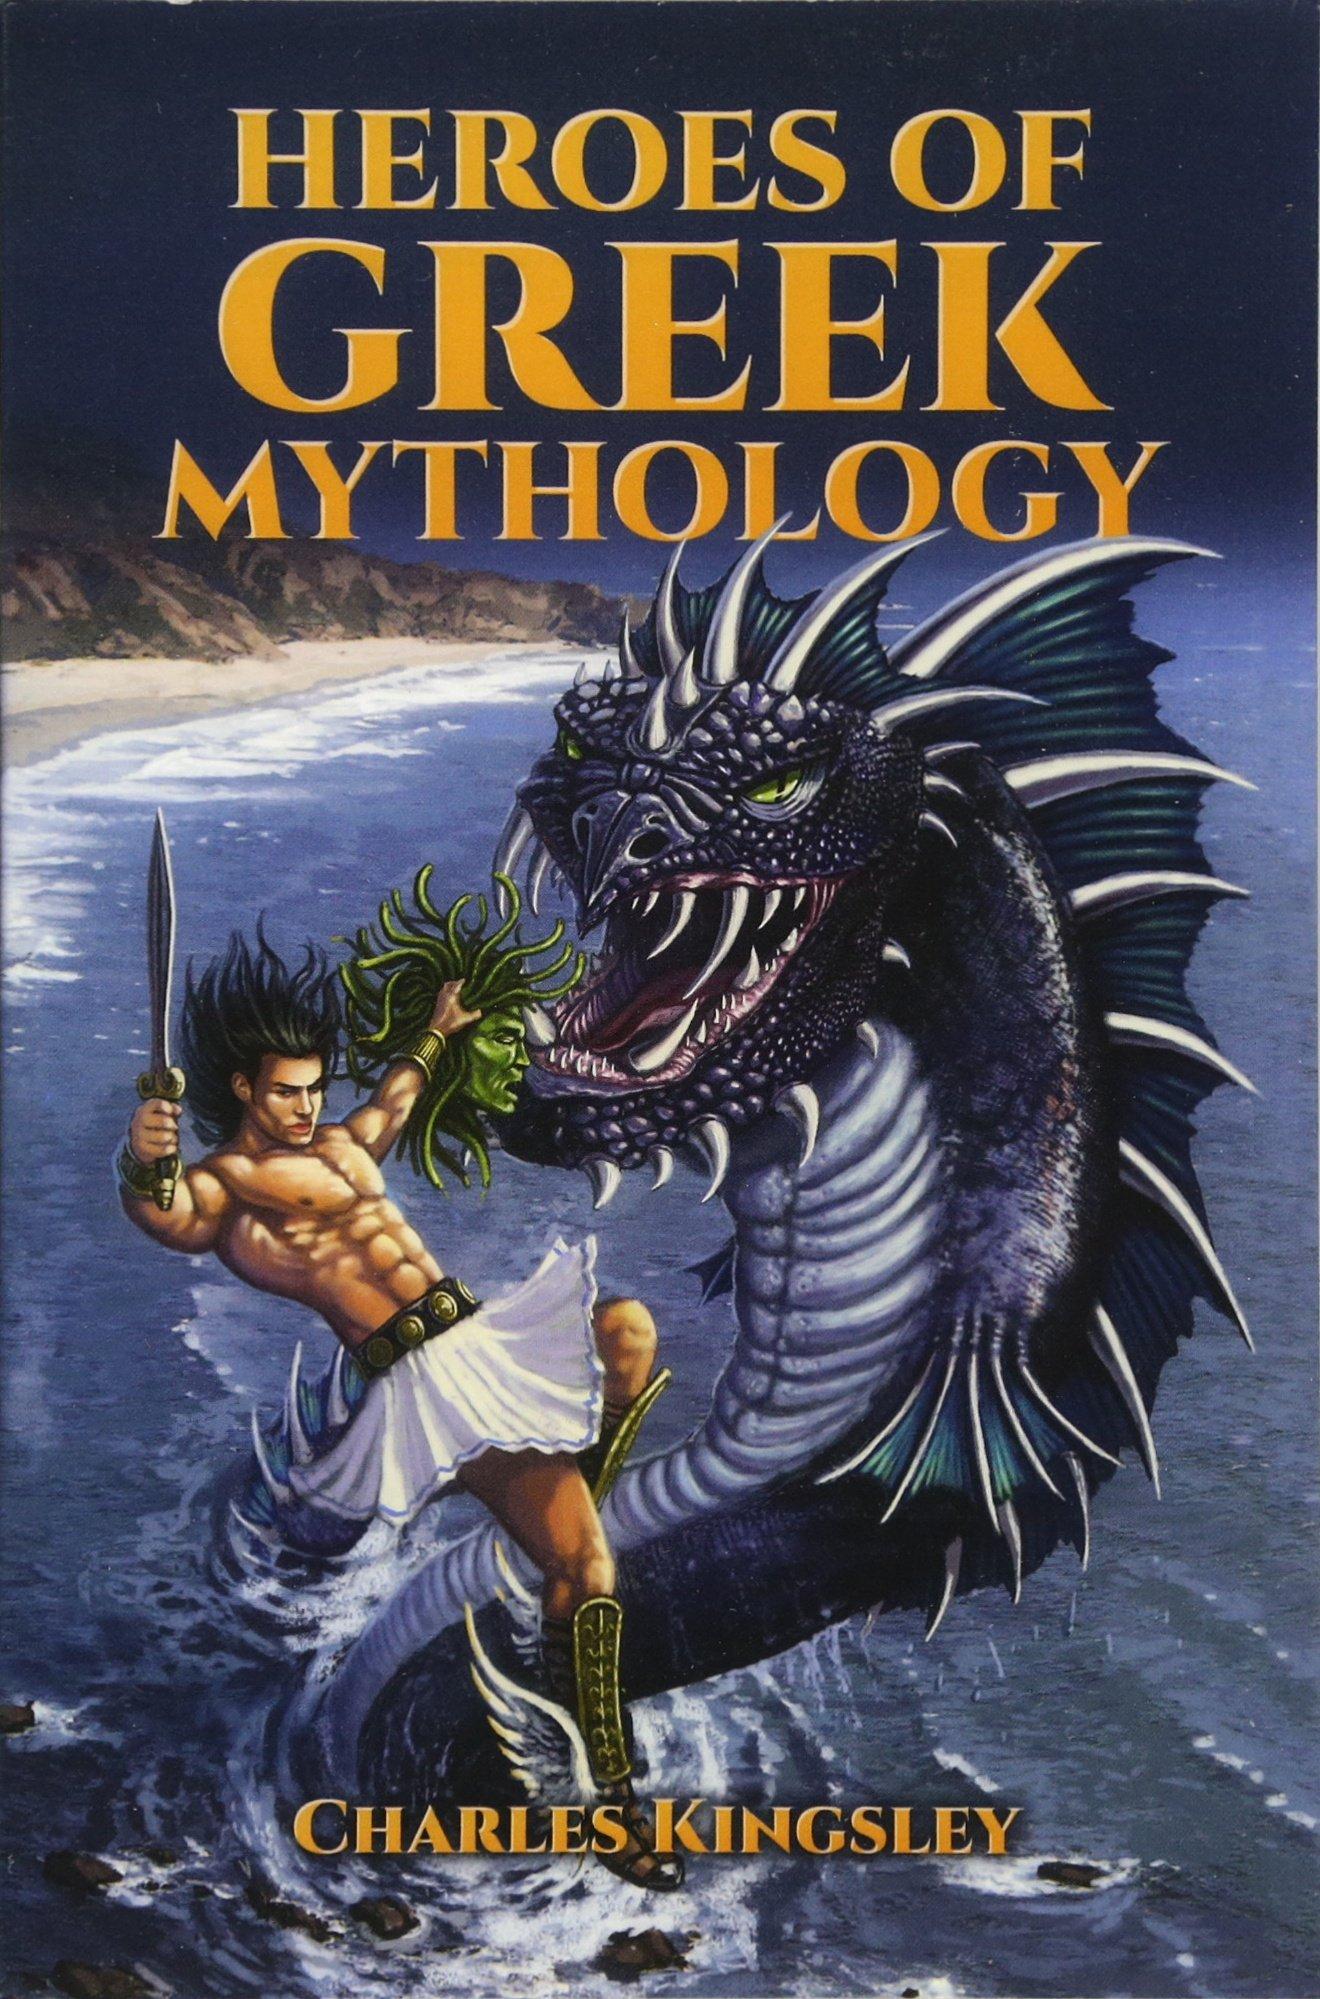 Heroes of Greek Mythology (Dover Children's Classics) ePub fb2 ebook